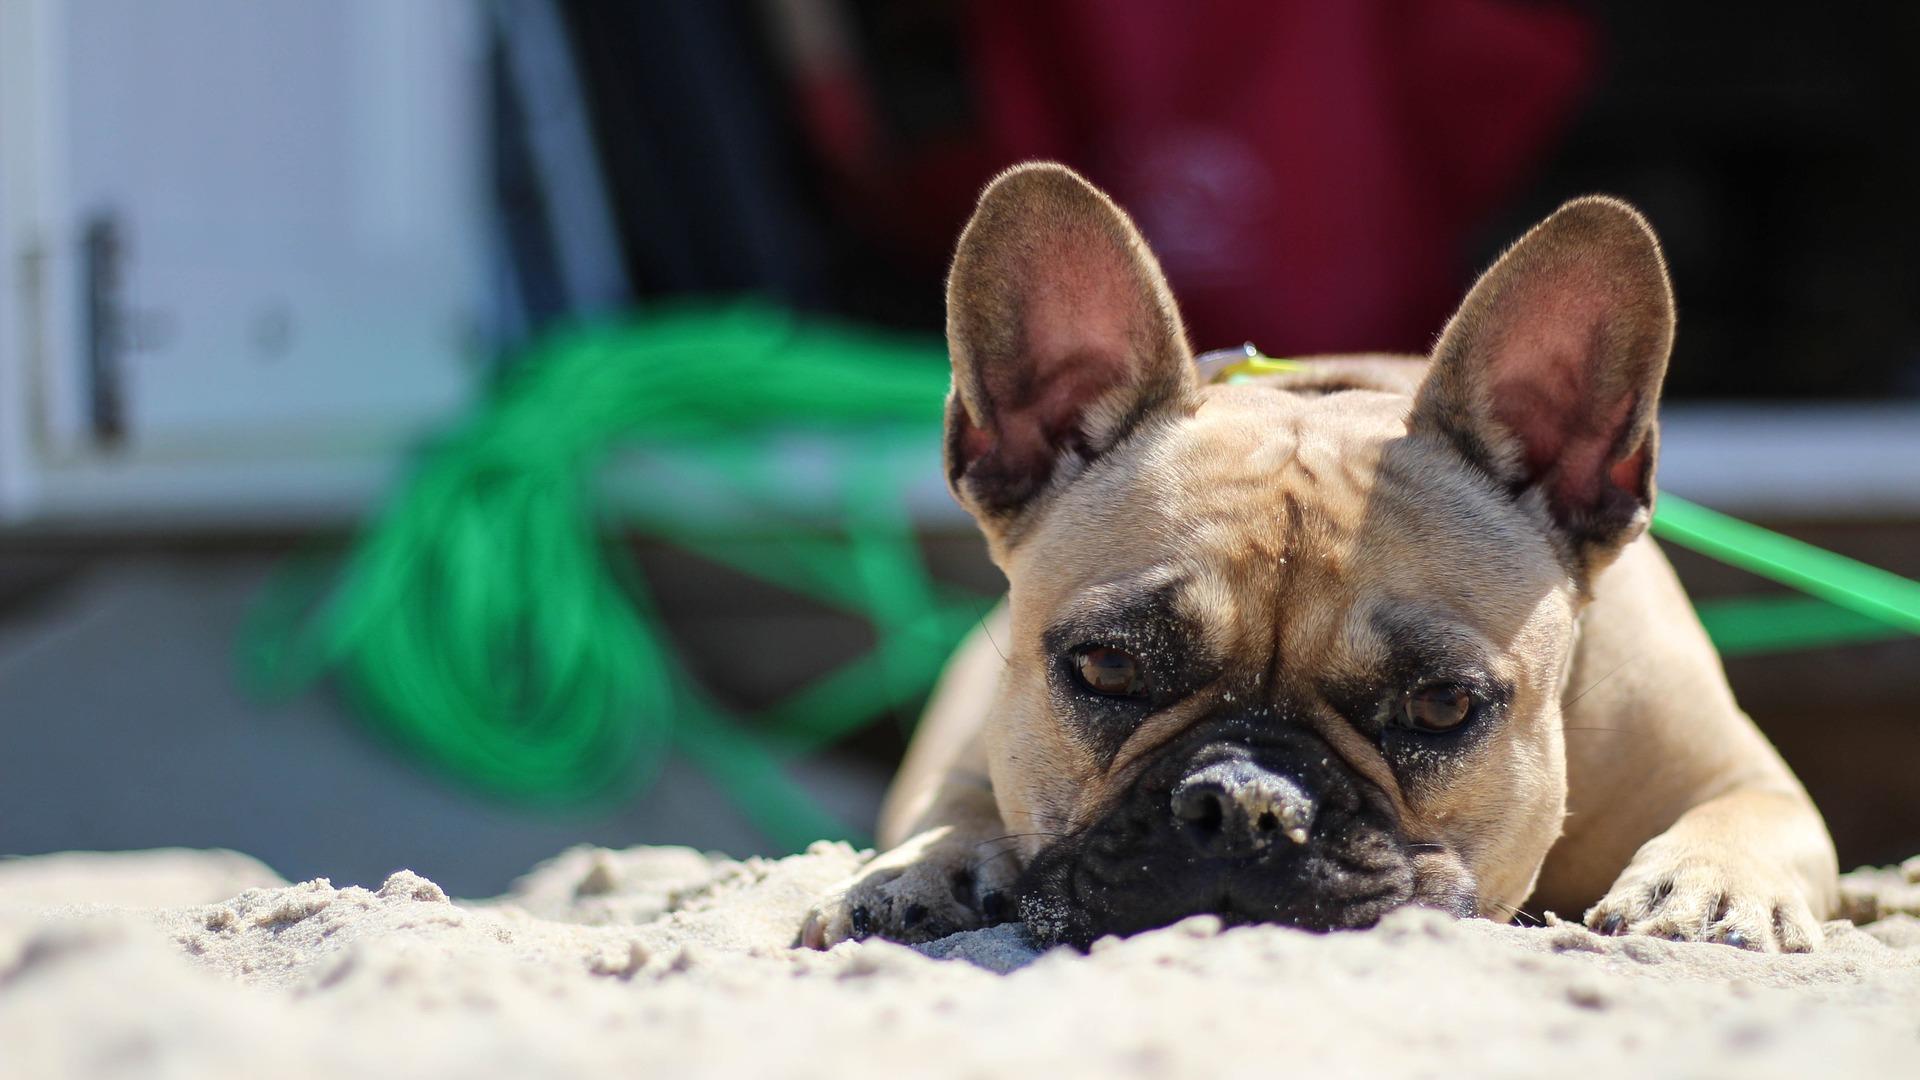 Bulldog, Sand, Strand, Entspannen Sie sich, Blick - Wallpaper HD - Prof.-falken.com